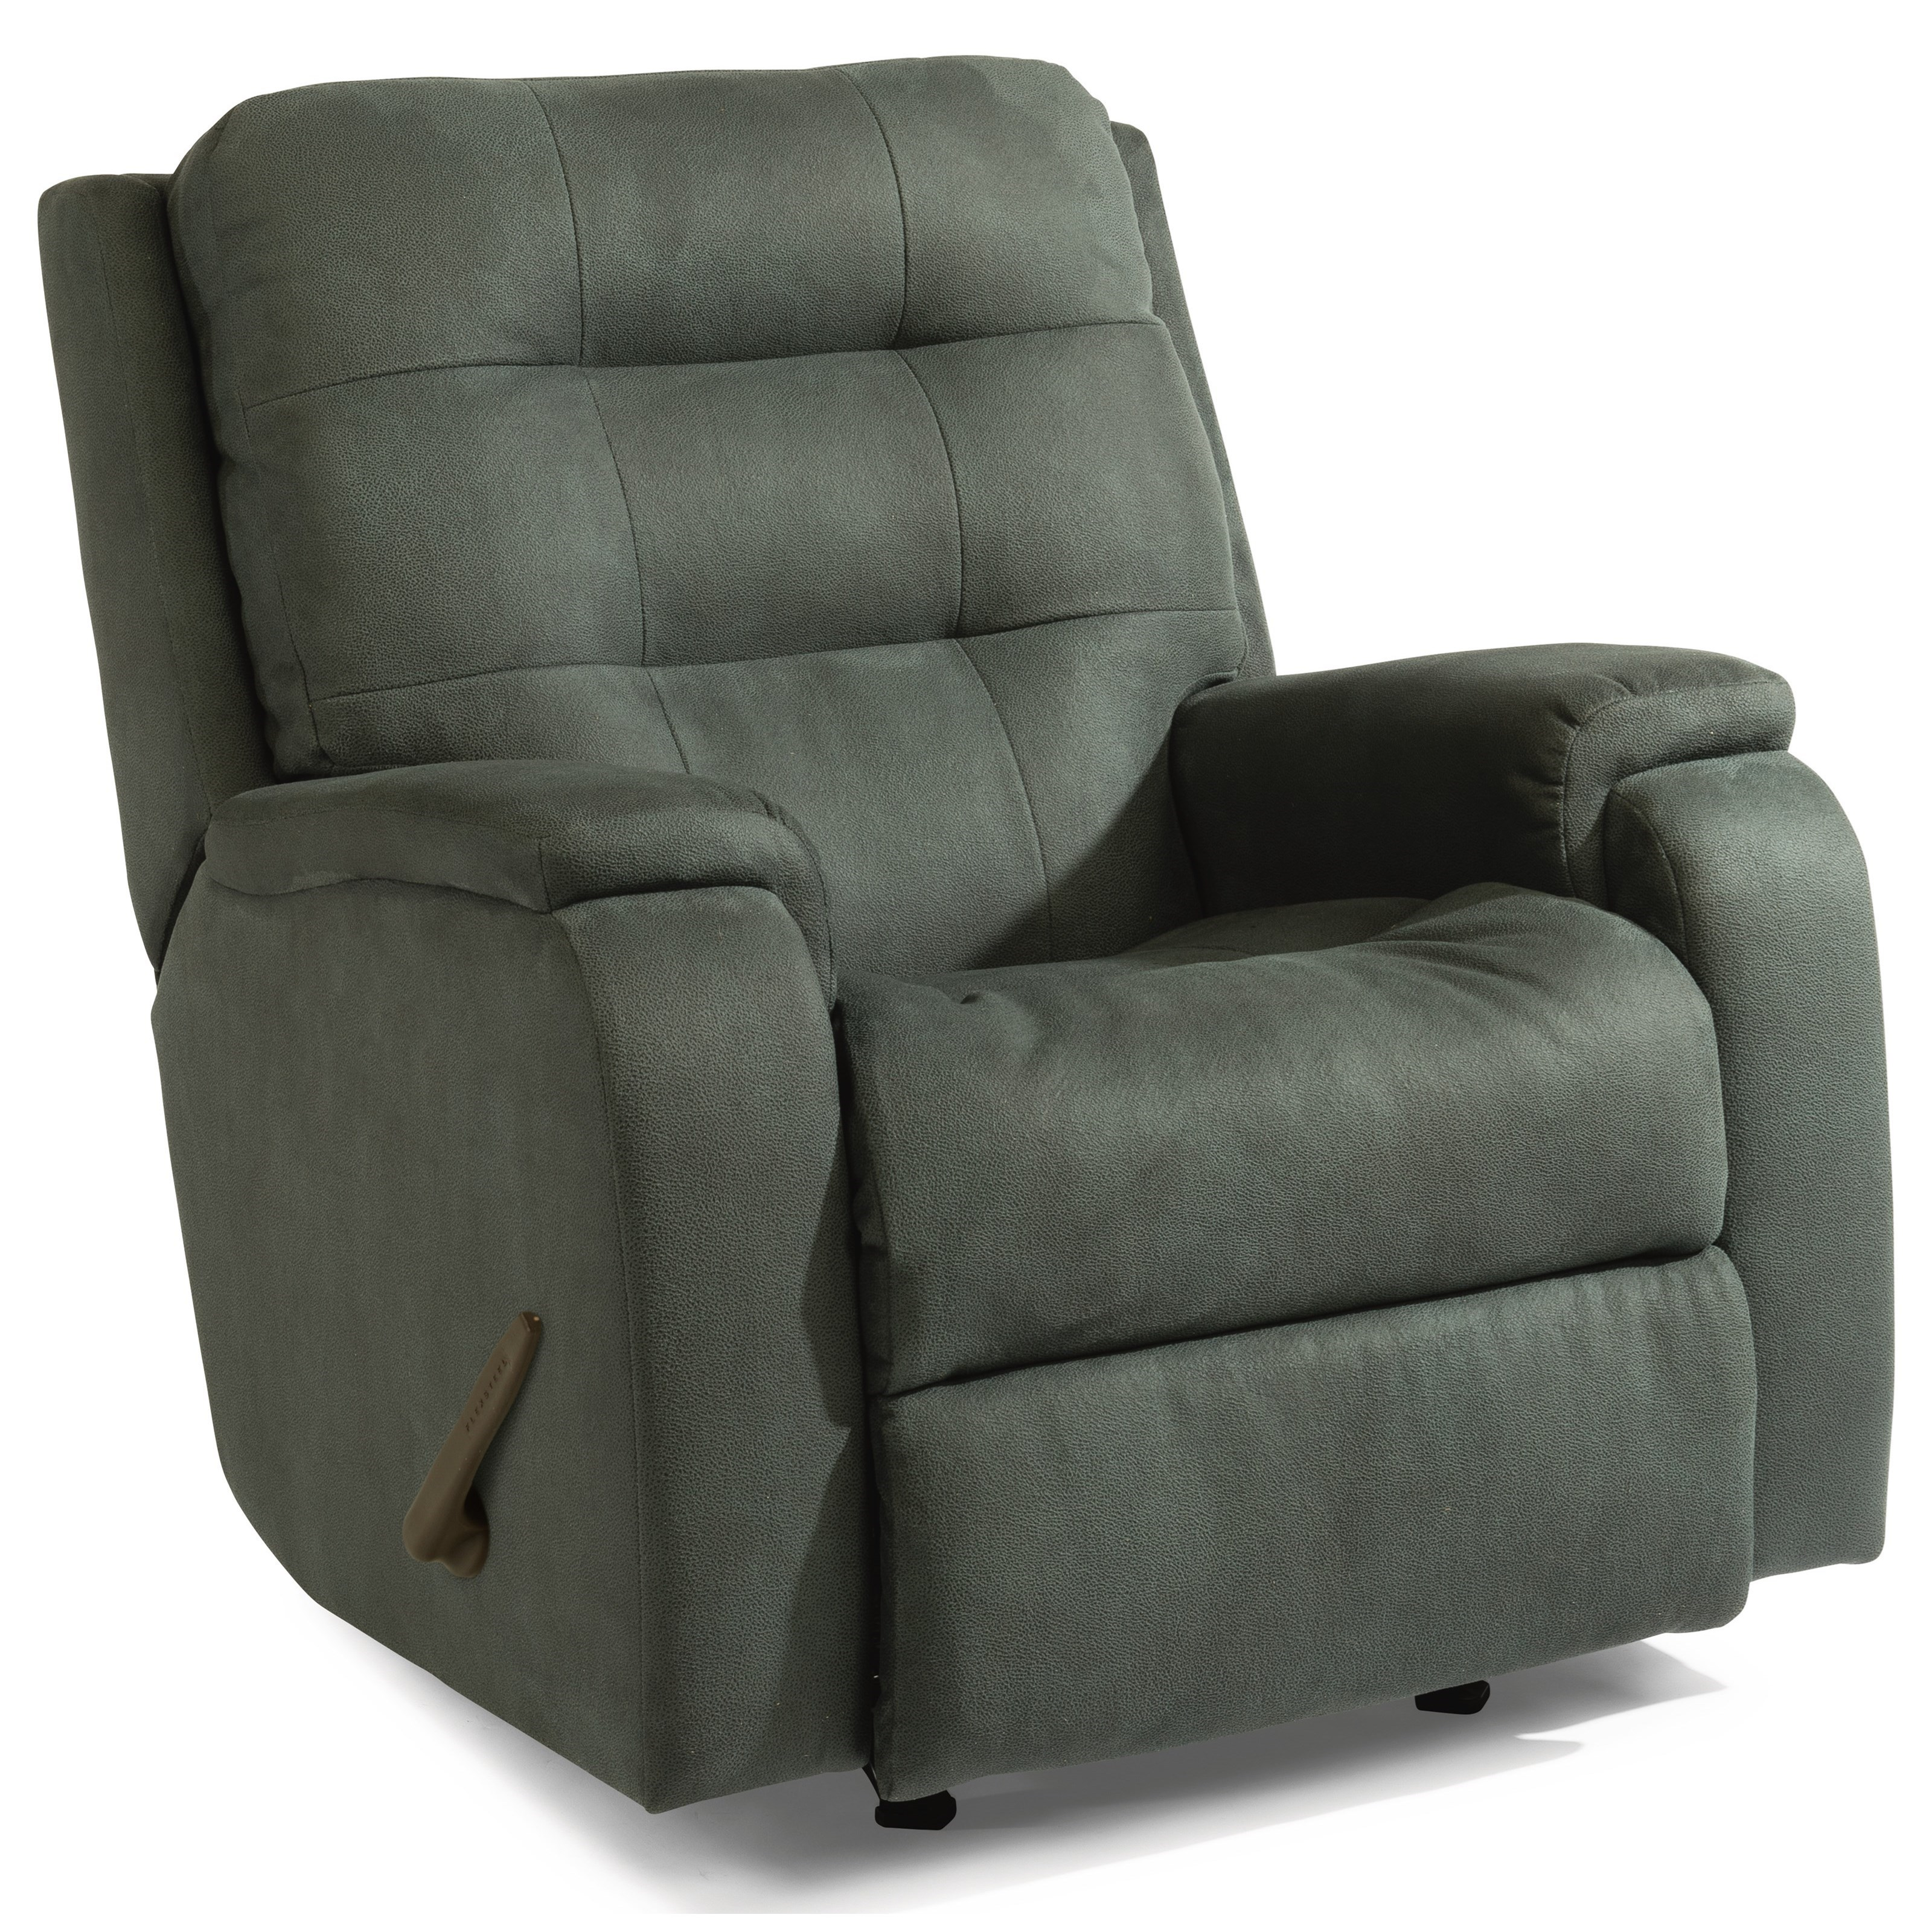 Arlo Rocking Recliner by Flexsteel at Mueller Furniture